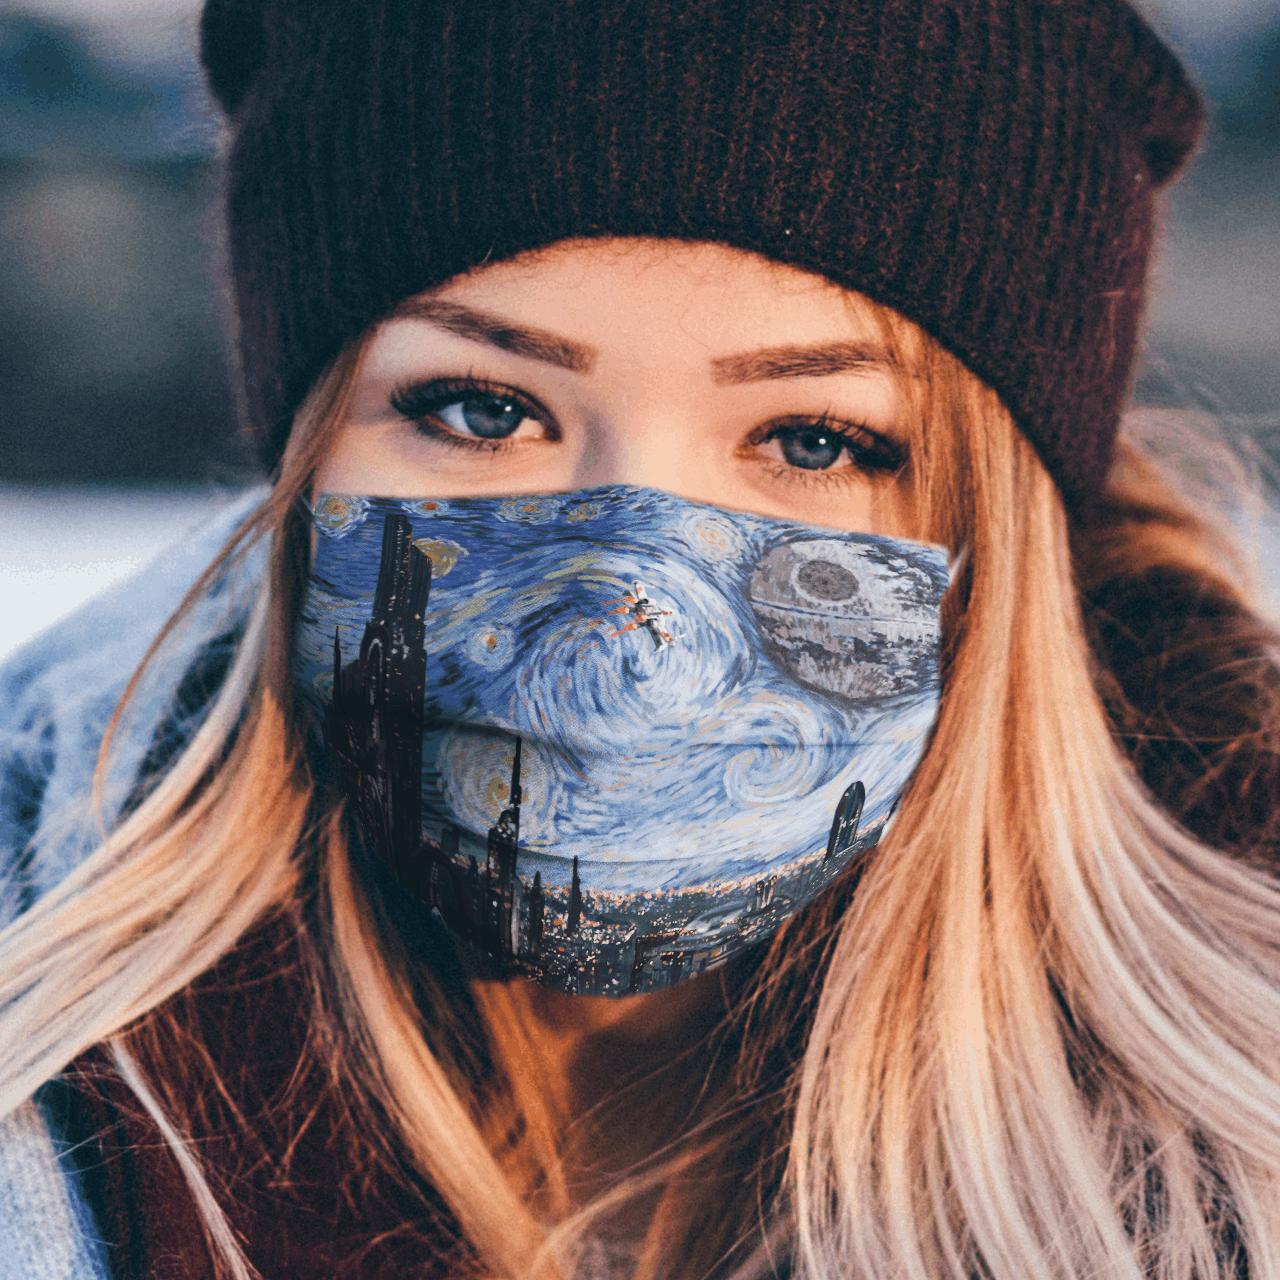 Starry night van gogh Star Wars face mask